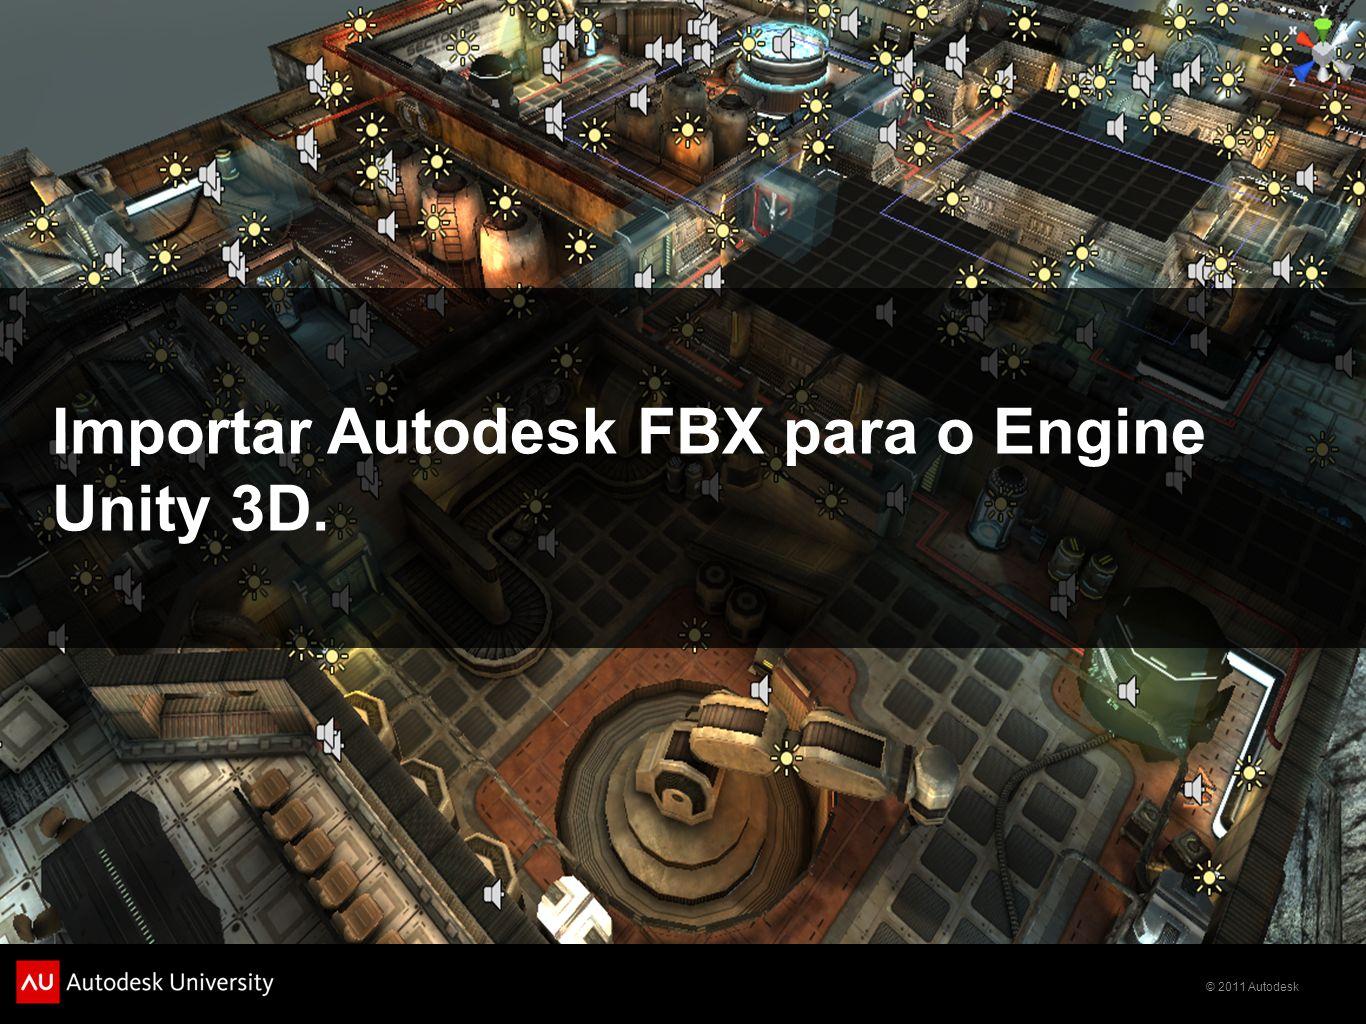 Importar Autodesk FBX para o Engine Unity 3D.